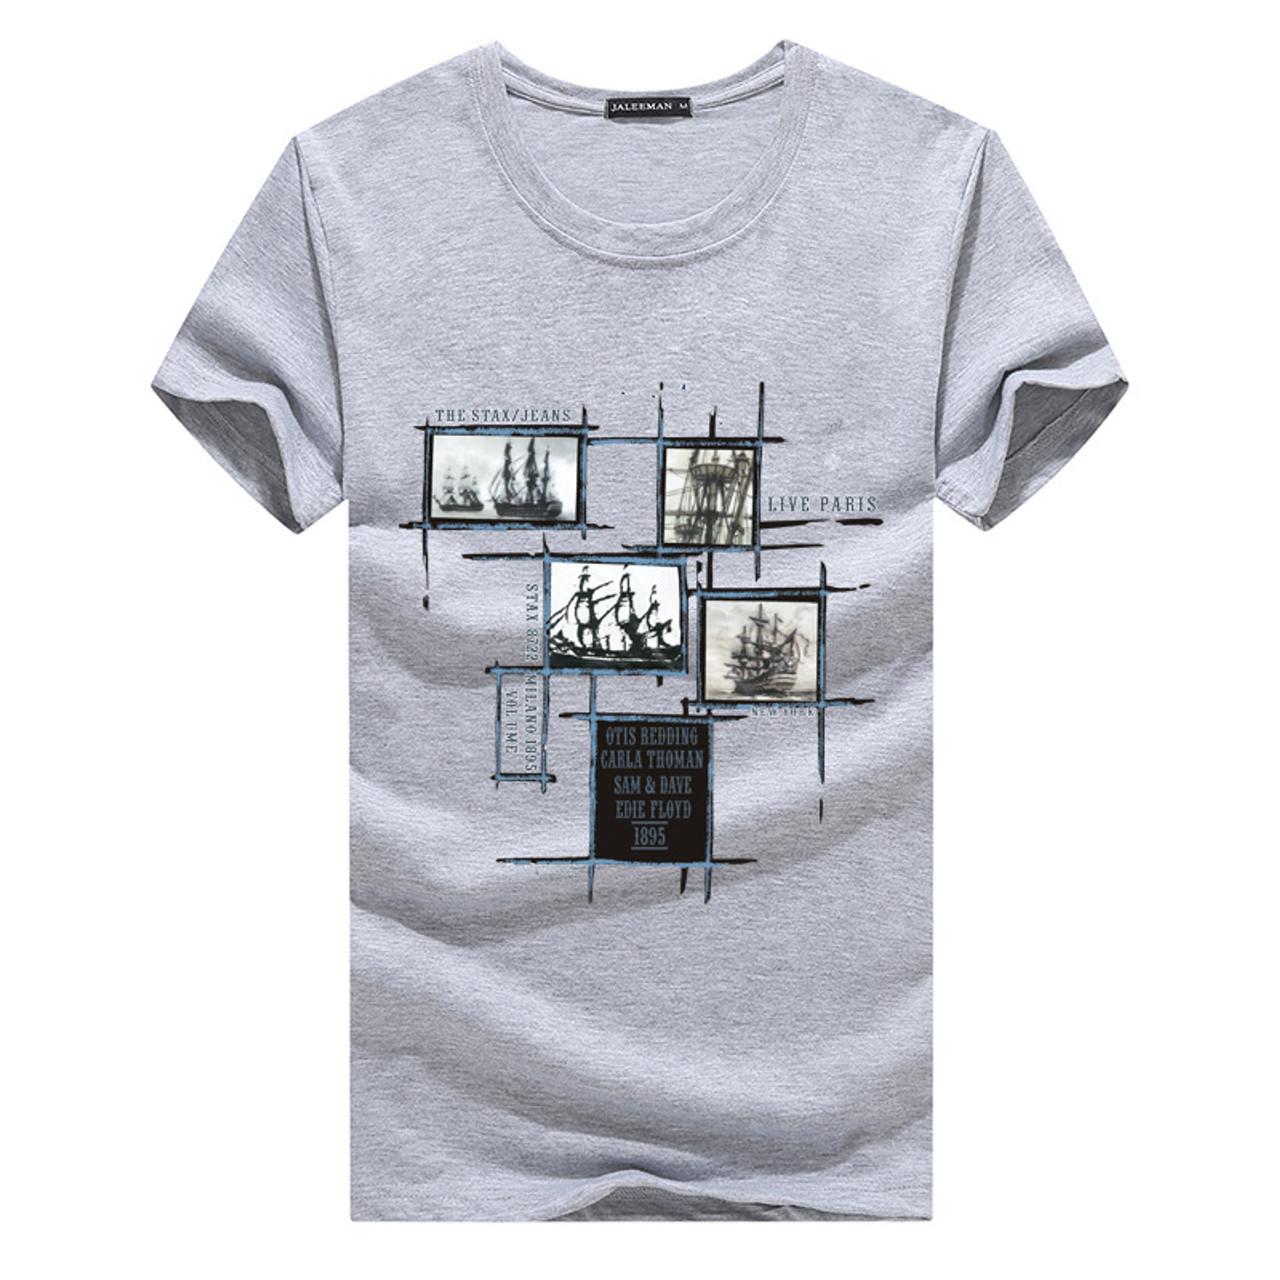 acf26d67aab Jalee Man 2018 Men s T-Shirts Plus Size 5XL Tee Shirt Homme Summer Short  Sleeve Men T Shirts Male TShirts Camiseta Tshirt Homme